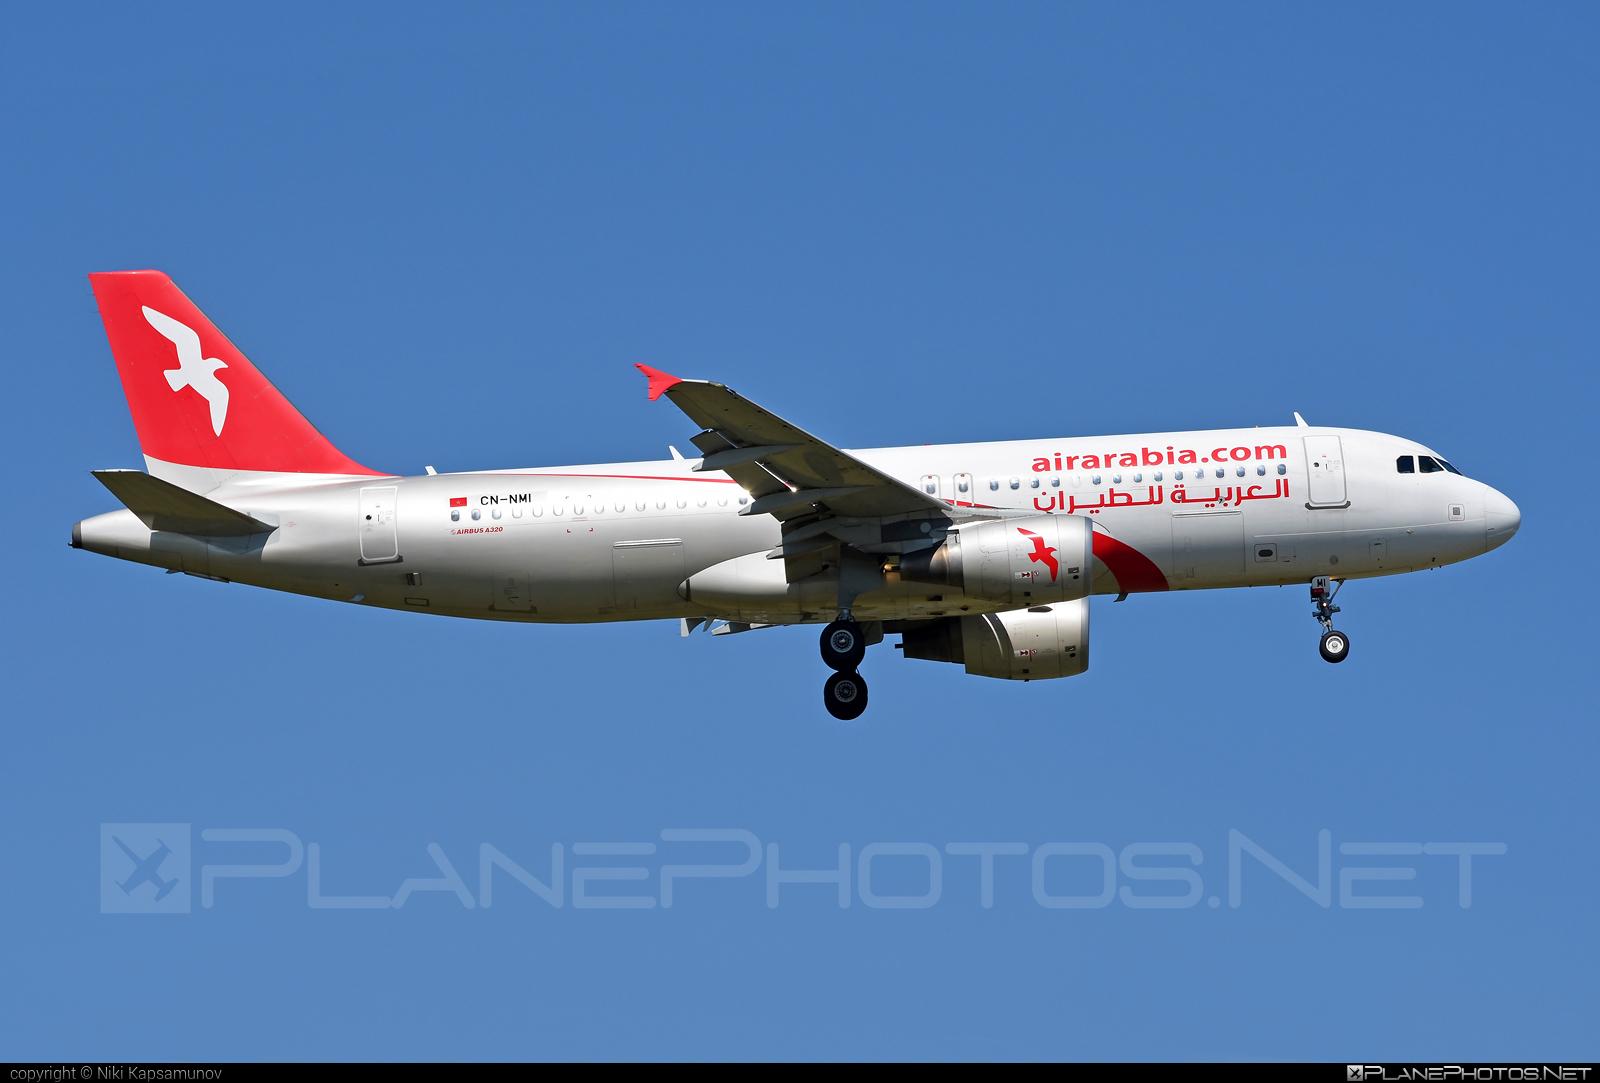 Airbus A320-214 - CN-NMI operated by Air Arabia Maroc #a320 #a320family #airarabia #airarabiamaroc #airbus #airbus320